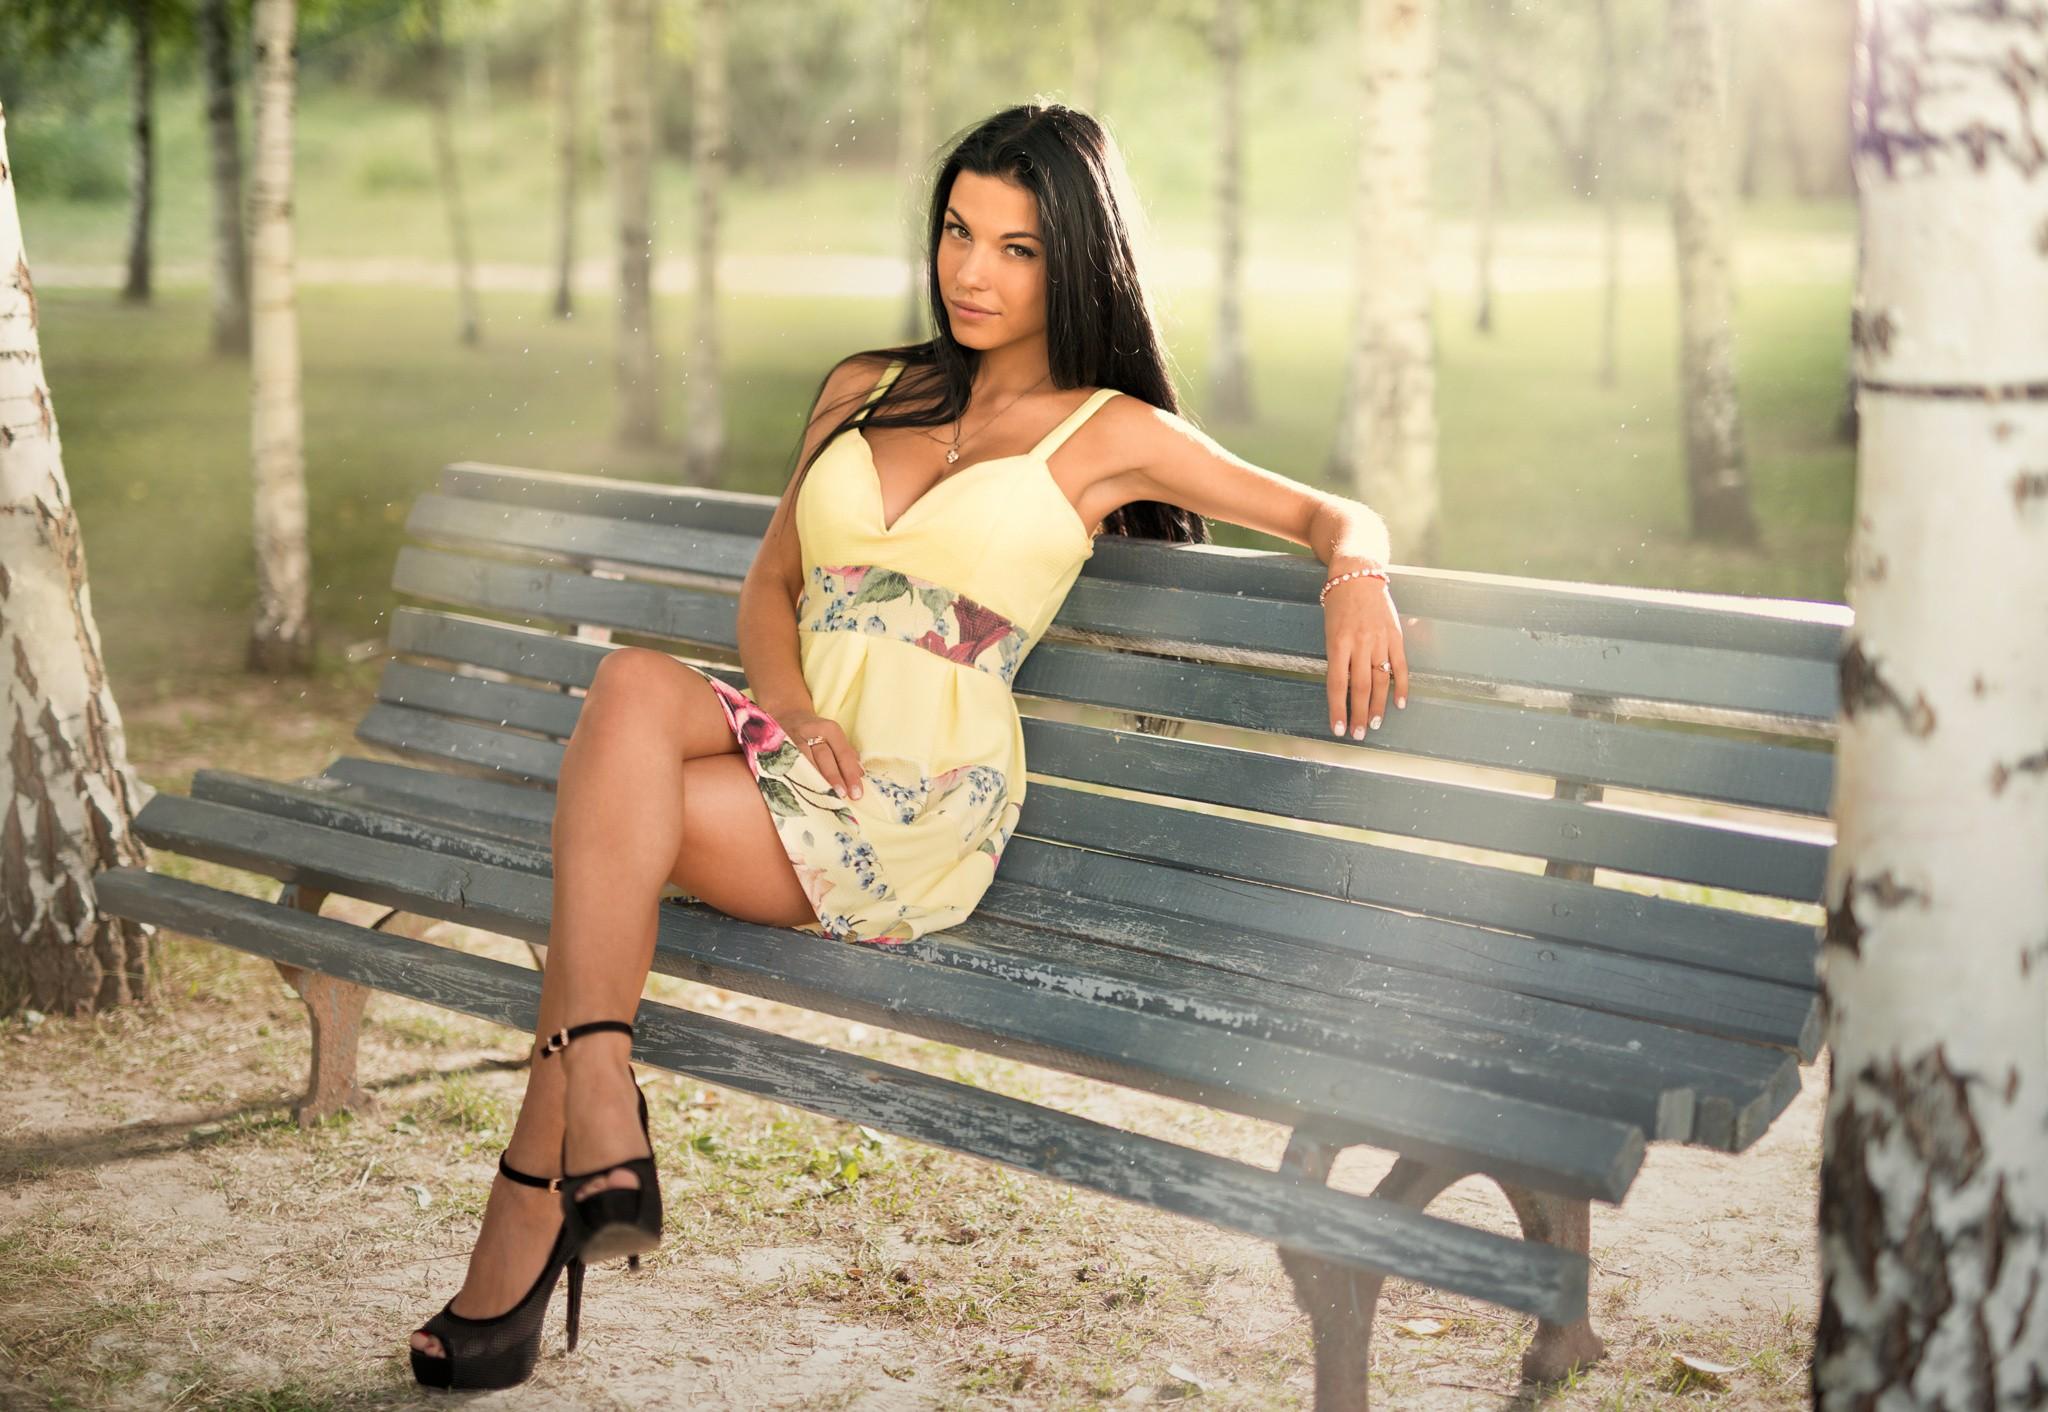 People 2048x1412 Marina Shimkovich women sitting dress high heels bench yellow dress outdoors trees looking at viewer heels black heels summer dress legs crossed model